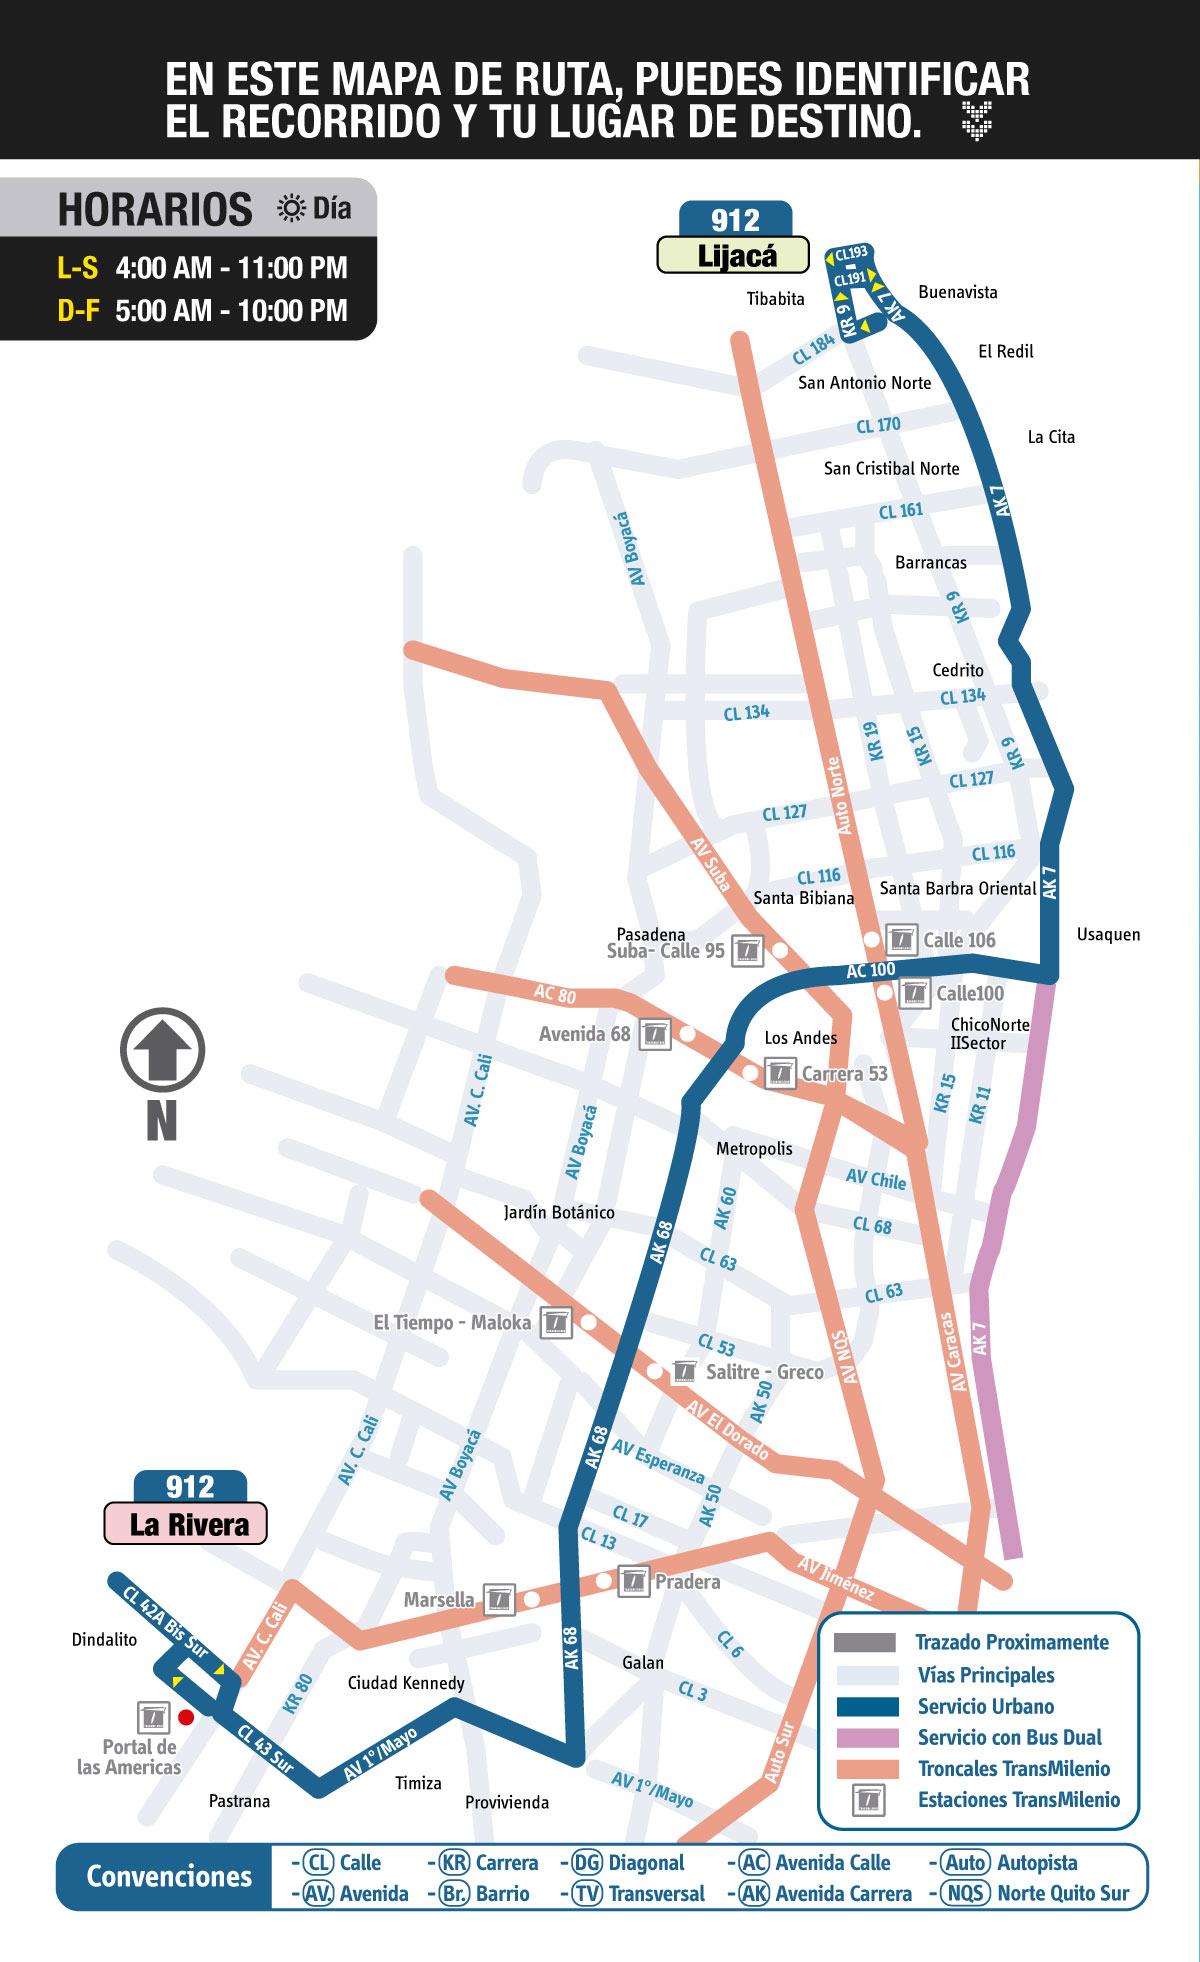 Mapa ruta urbana 912 Lijacá - La Rivera